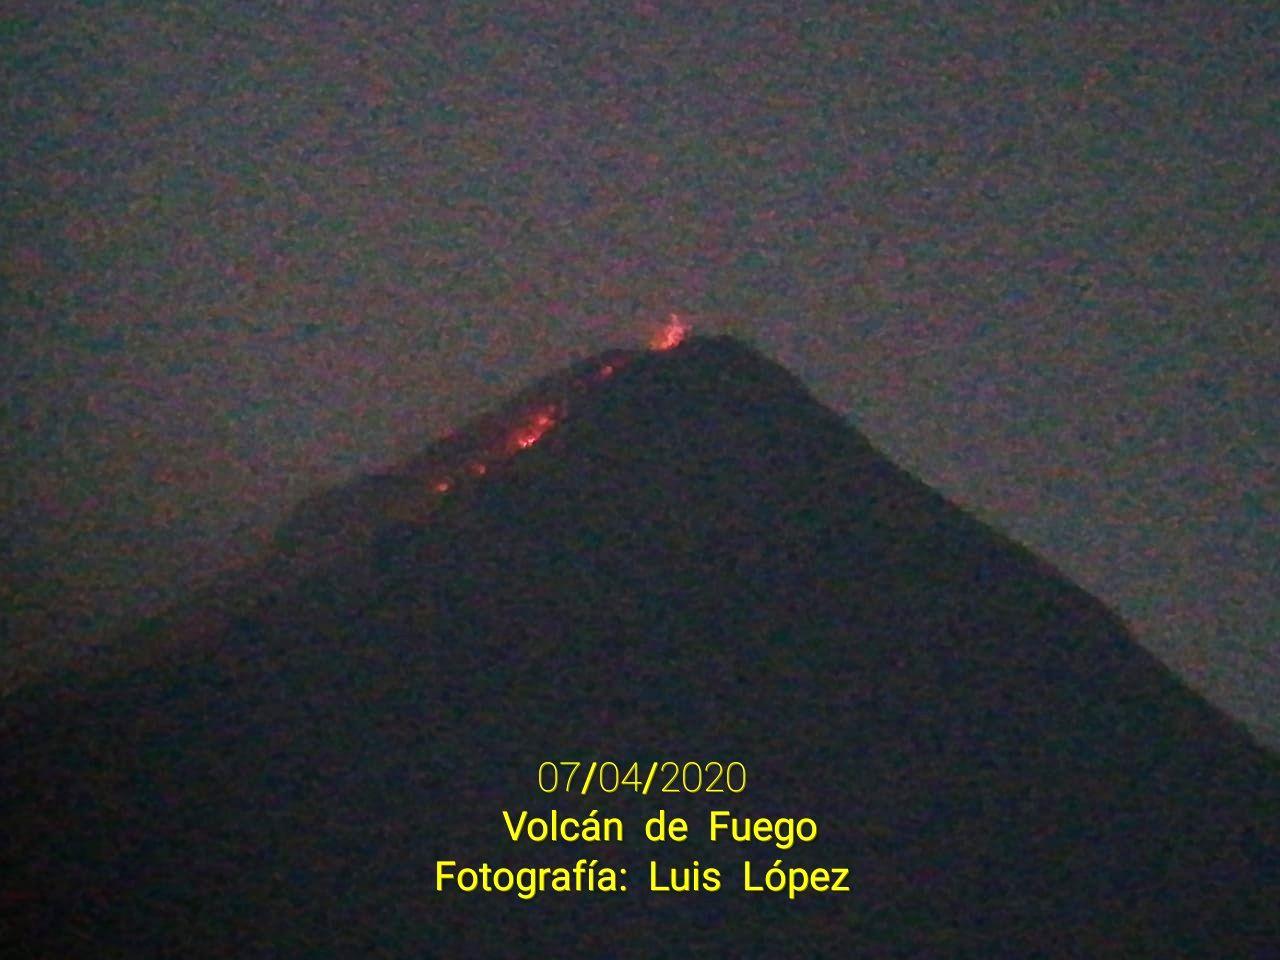 Fuego - incandescence and lava flow in the Ceniza barranca - photo 07.04.2020 Luis Lopez via W. Chigna / Twitter